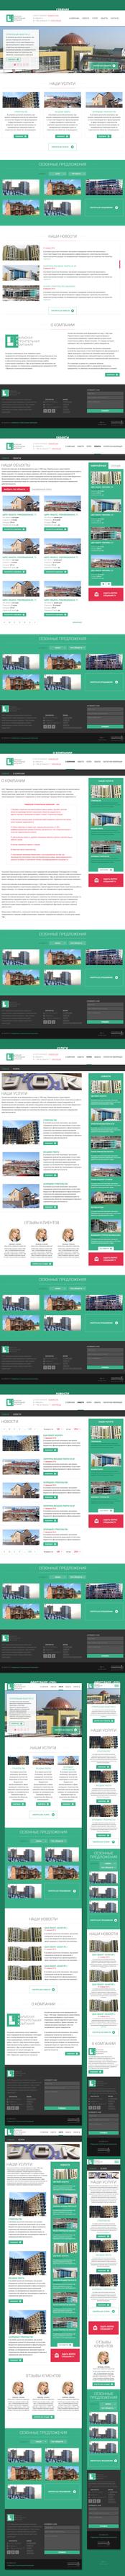 COMM Web Design #33 by Azatdraw